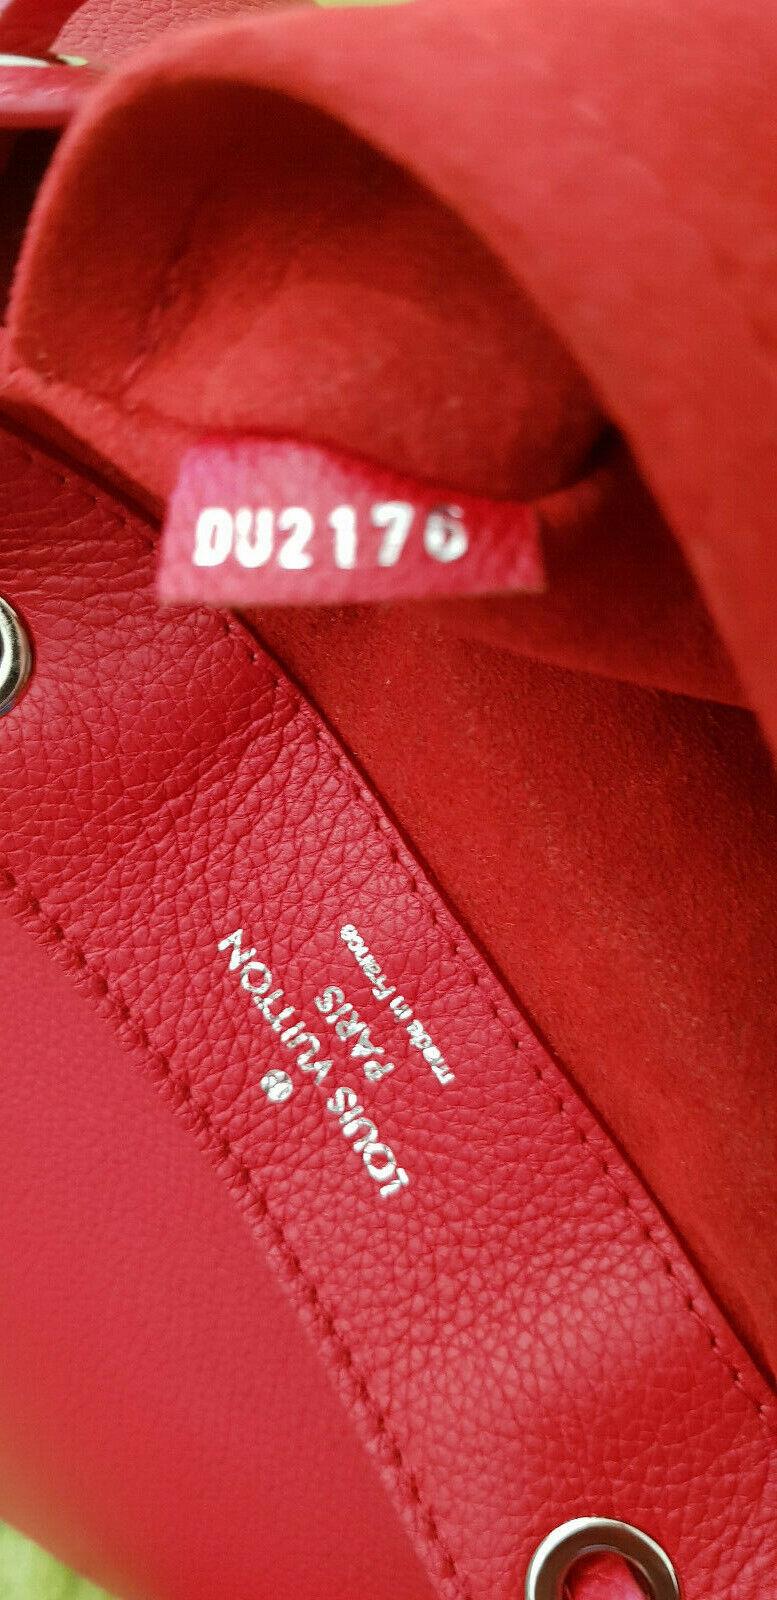 Louis Vuitton Lockme Backpack - image 3